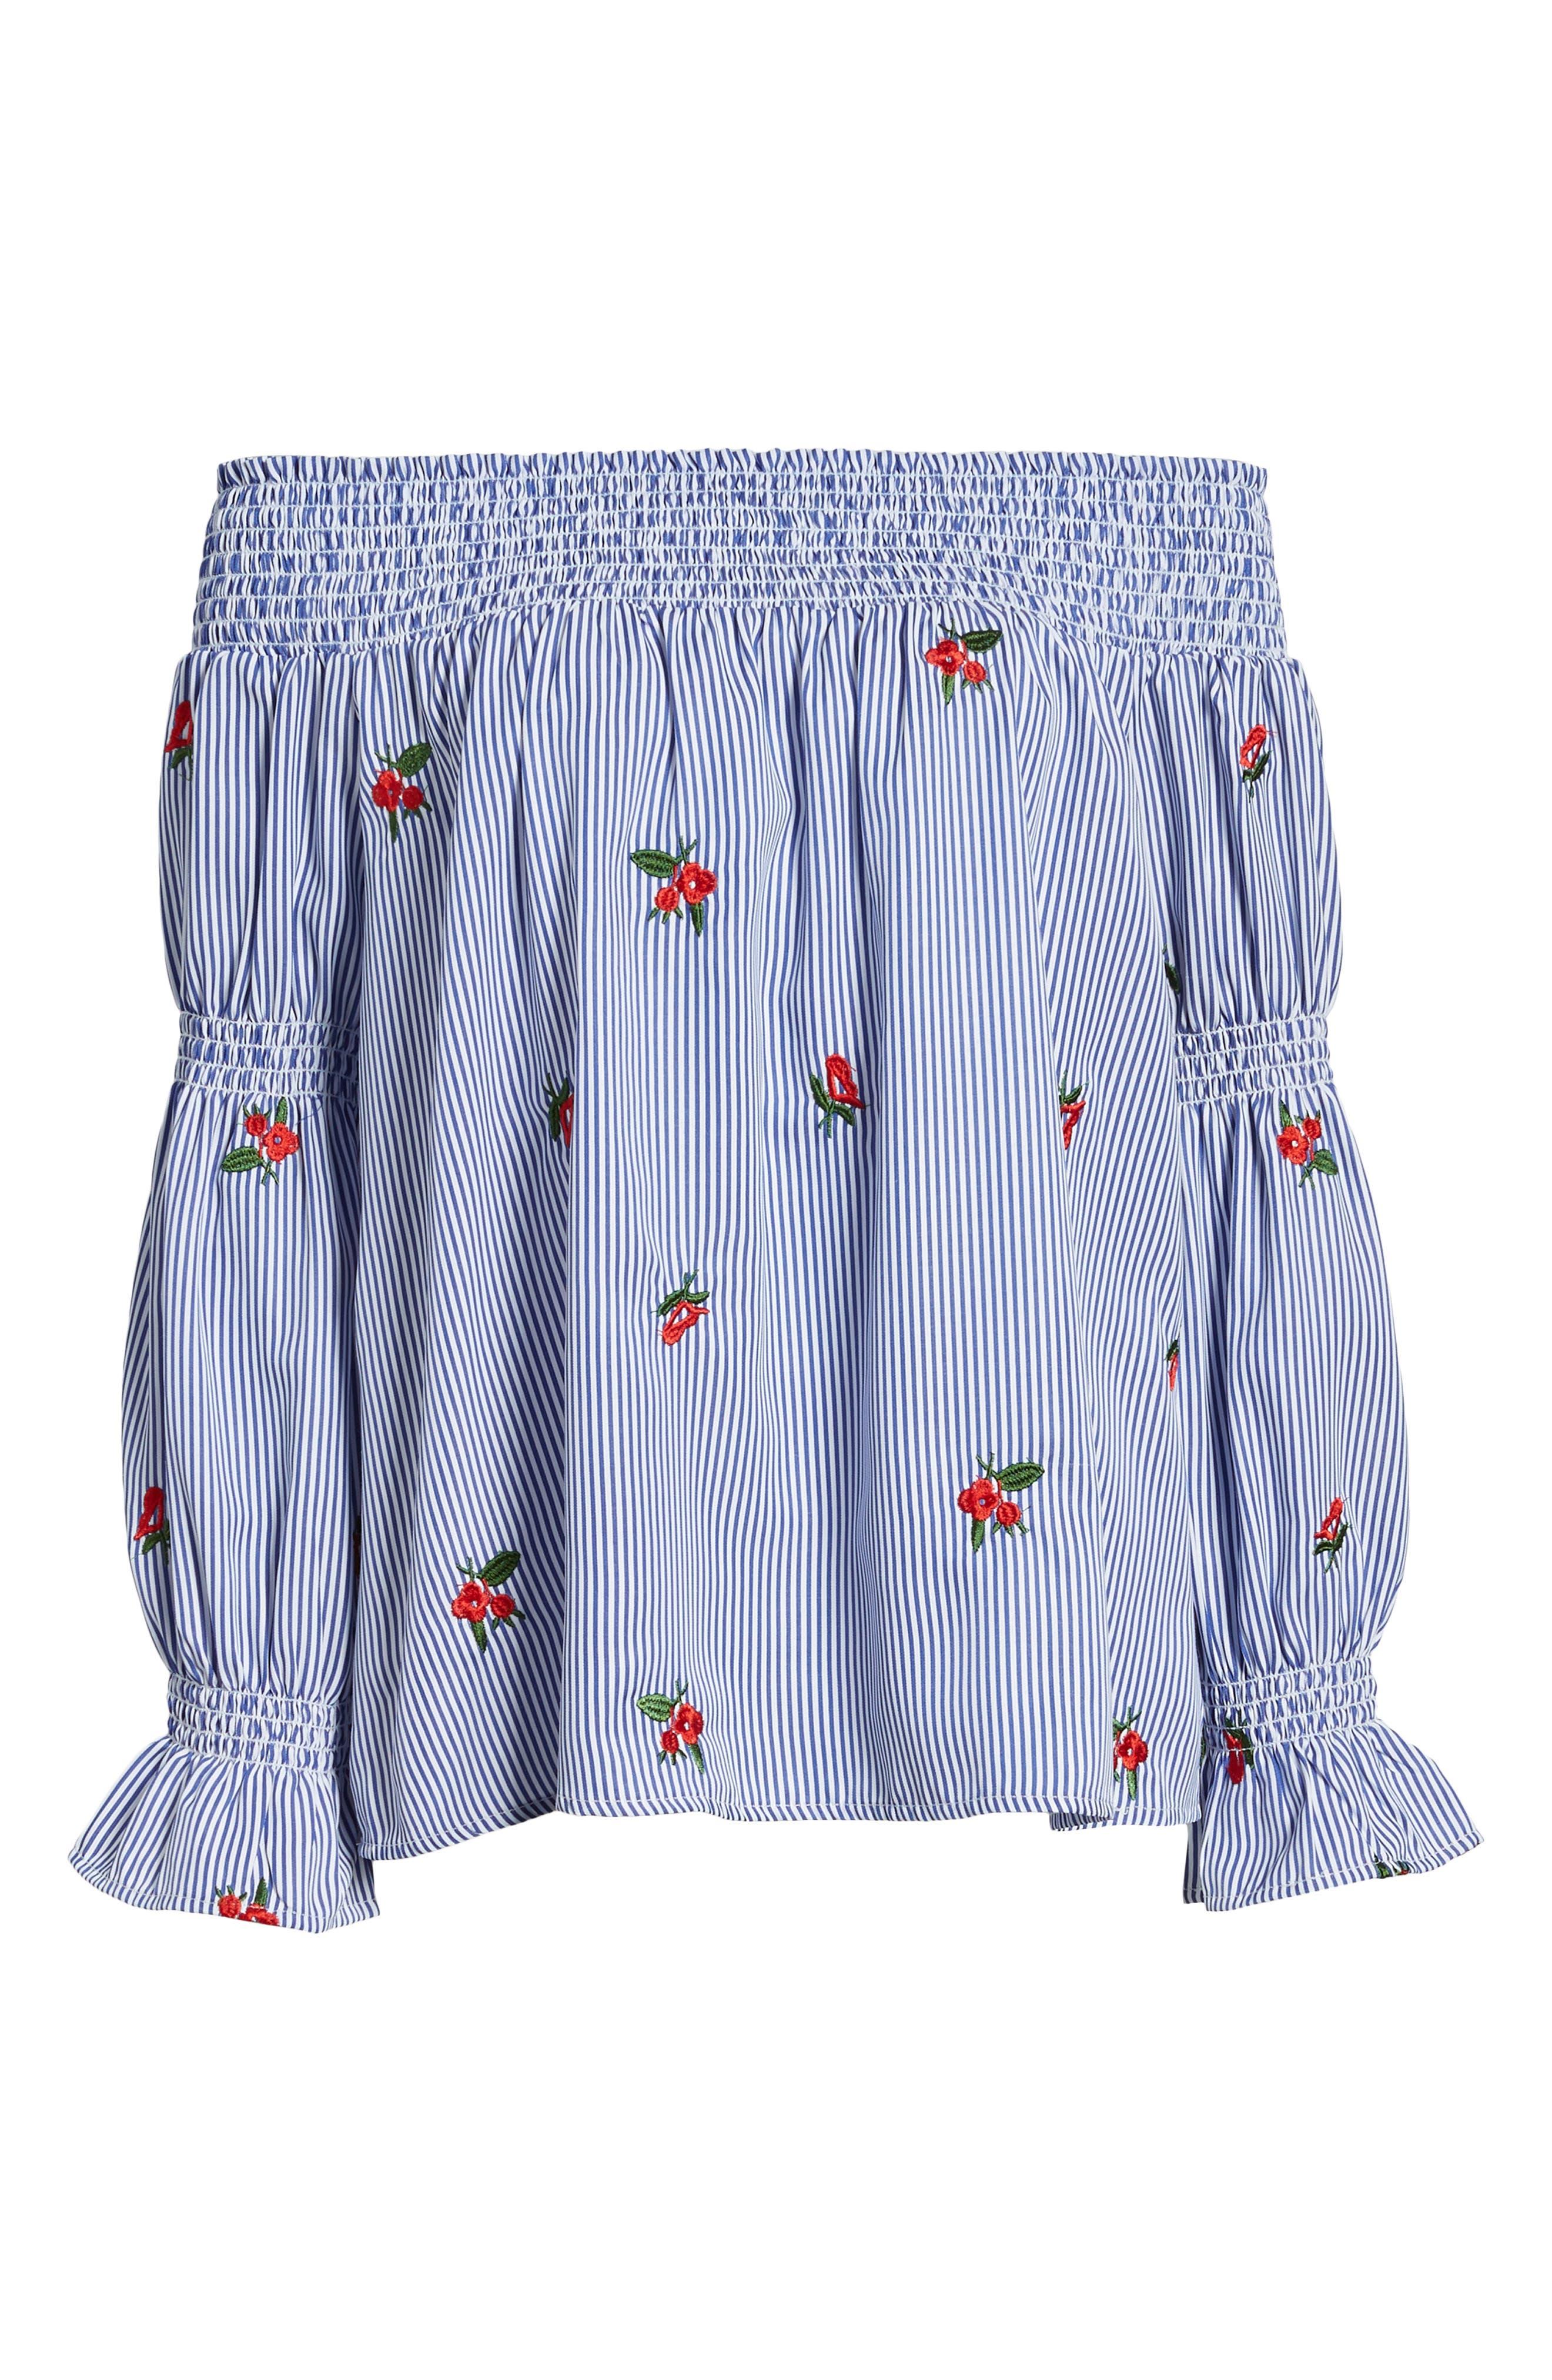 Floral Embroidered Stripe Off the Shoulder Top,                             Alternate thumbnail 7, color,                             Blue Stripe